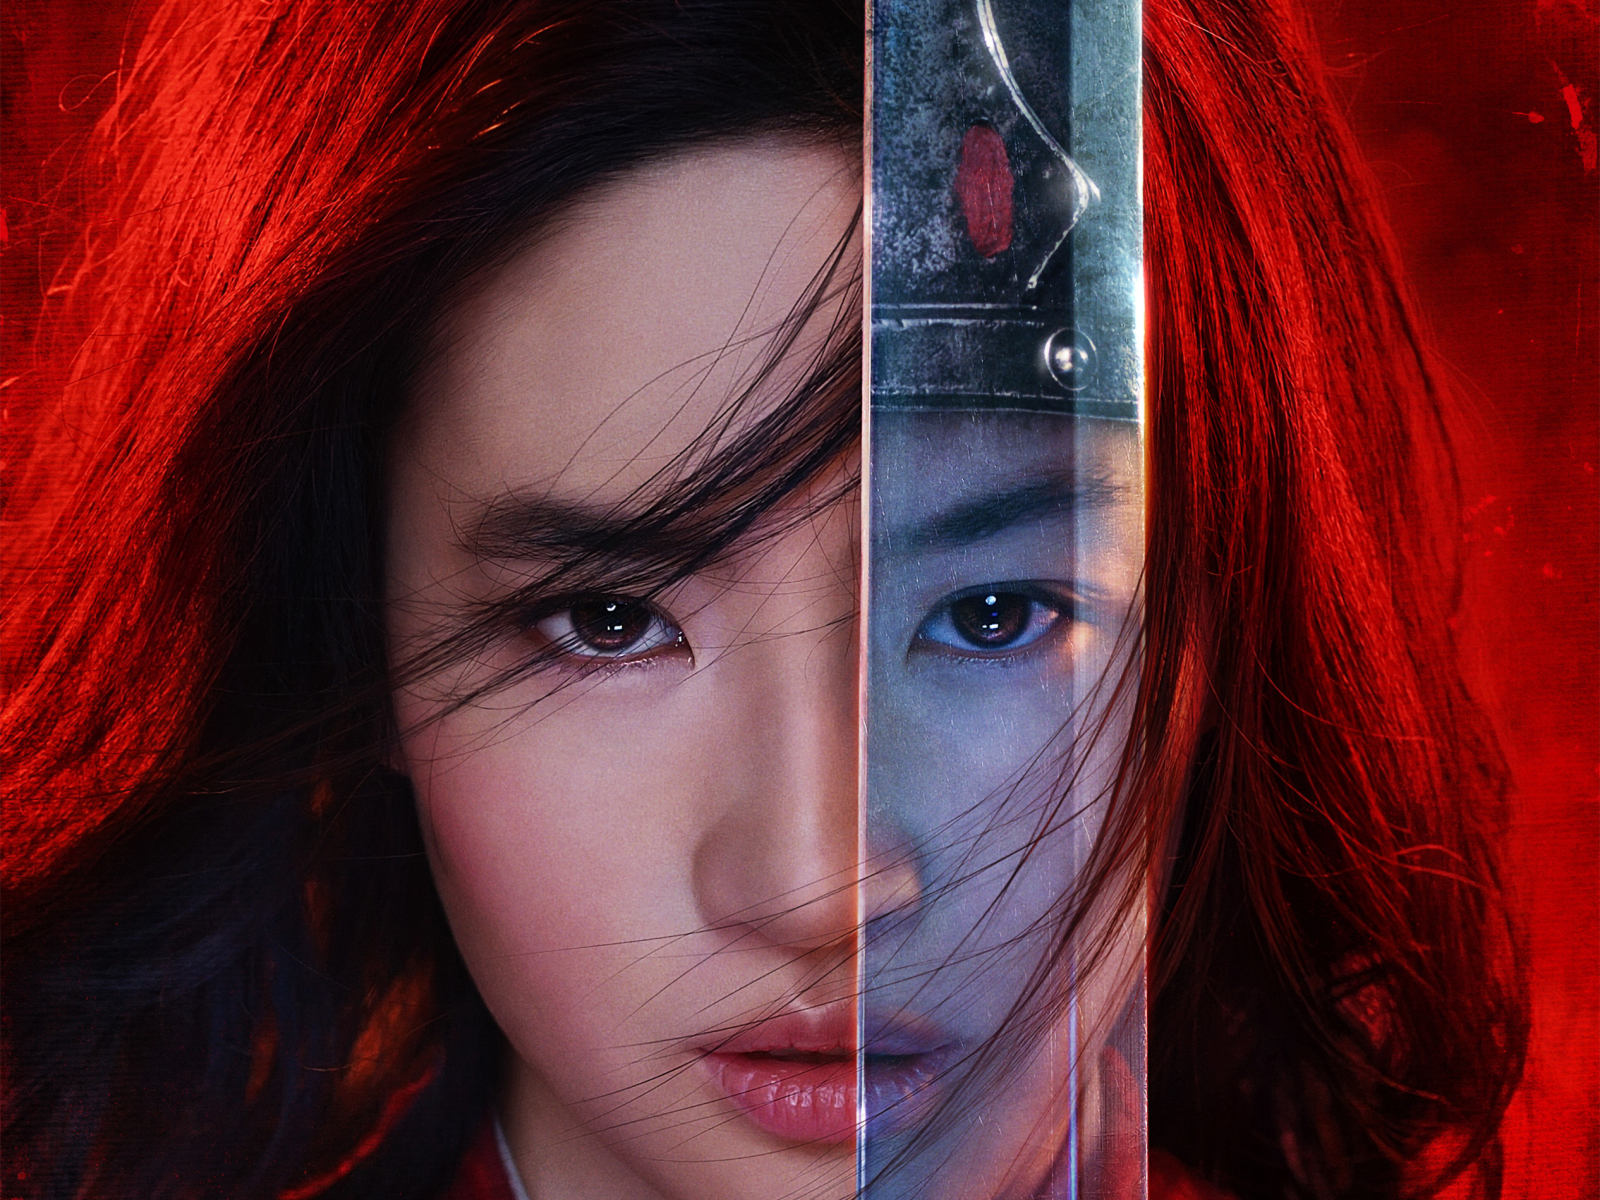 1600x1200 Mulan 2020 Movie Poster 1600x1200 Resolution Wallpaper 1600x1200